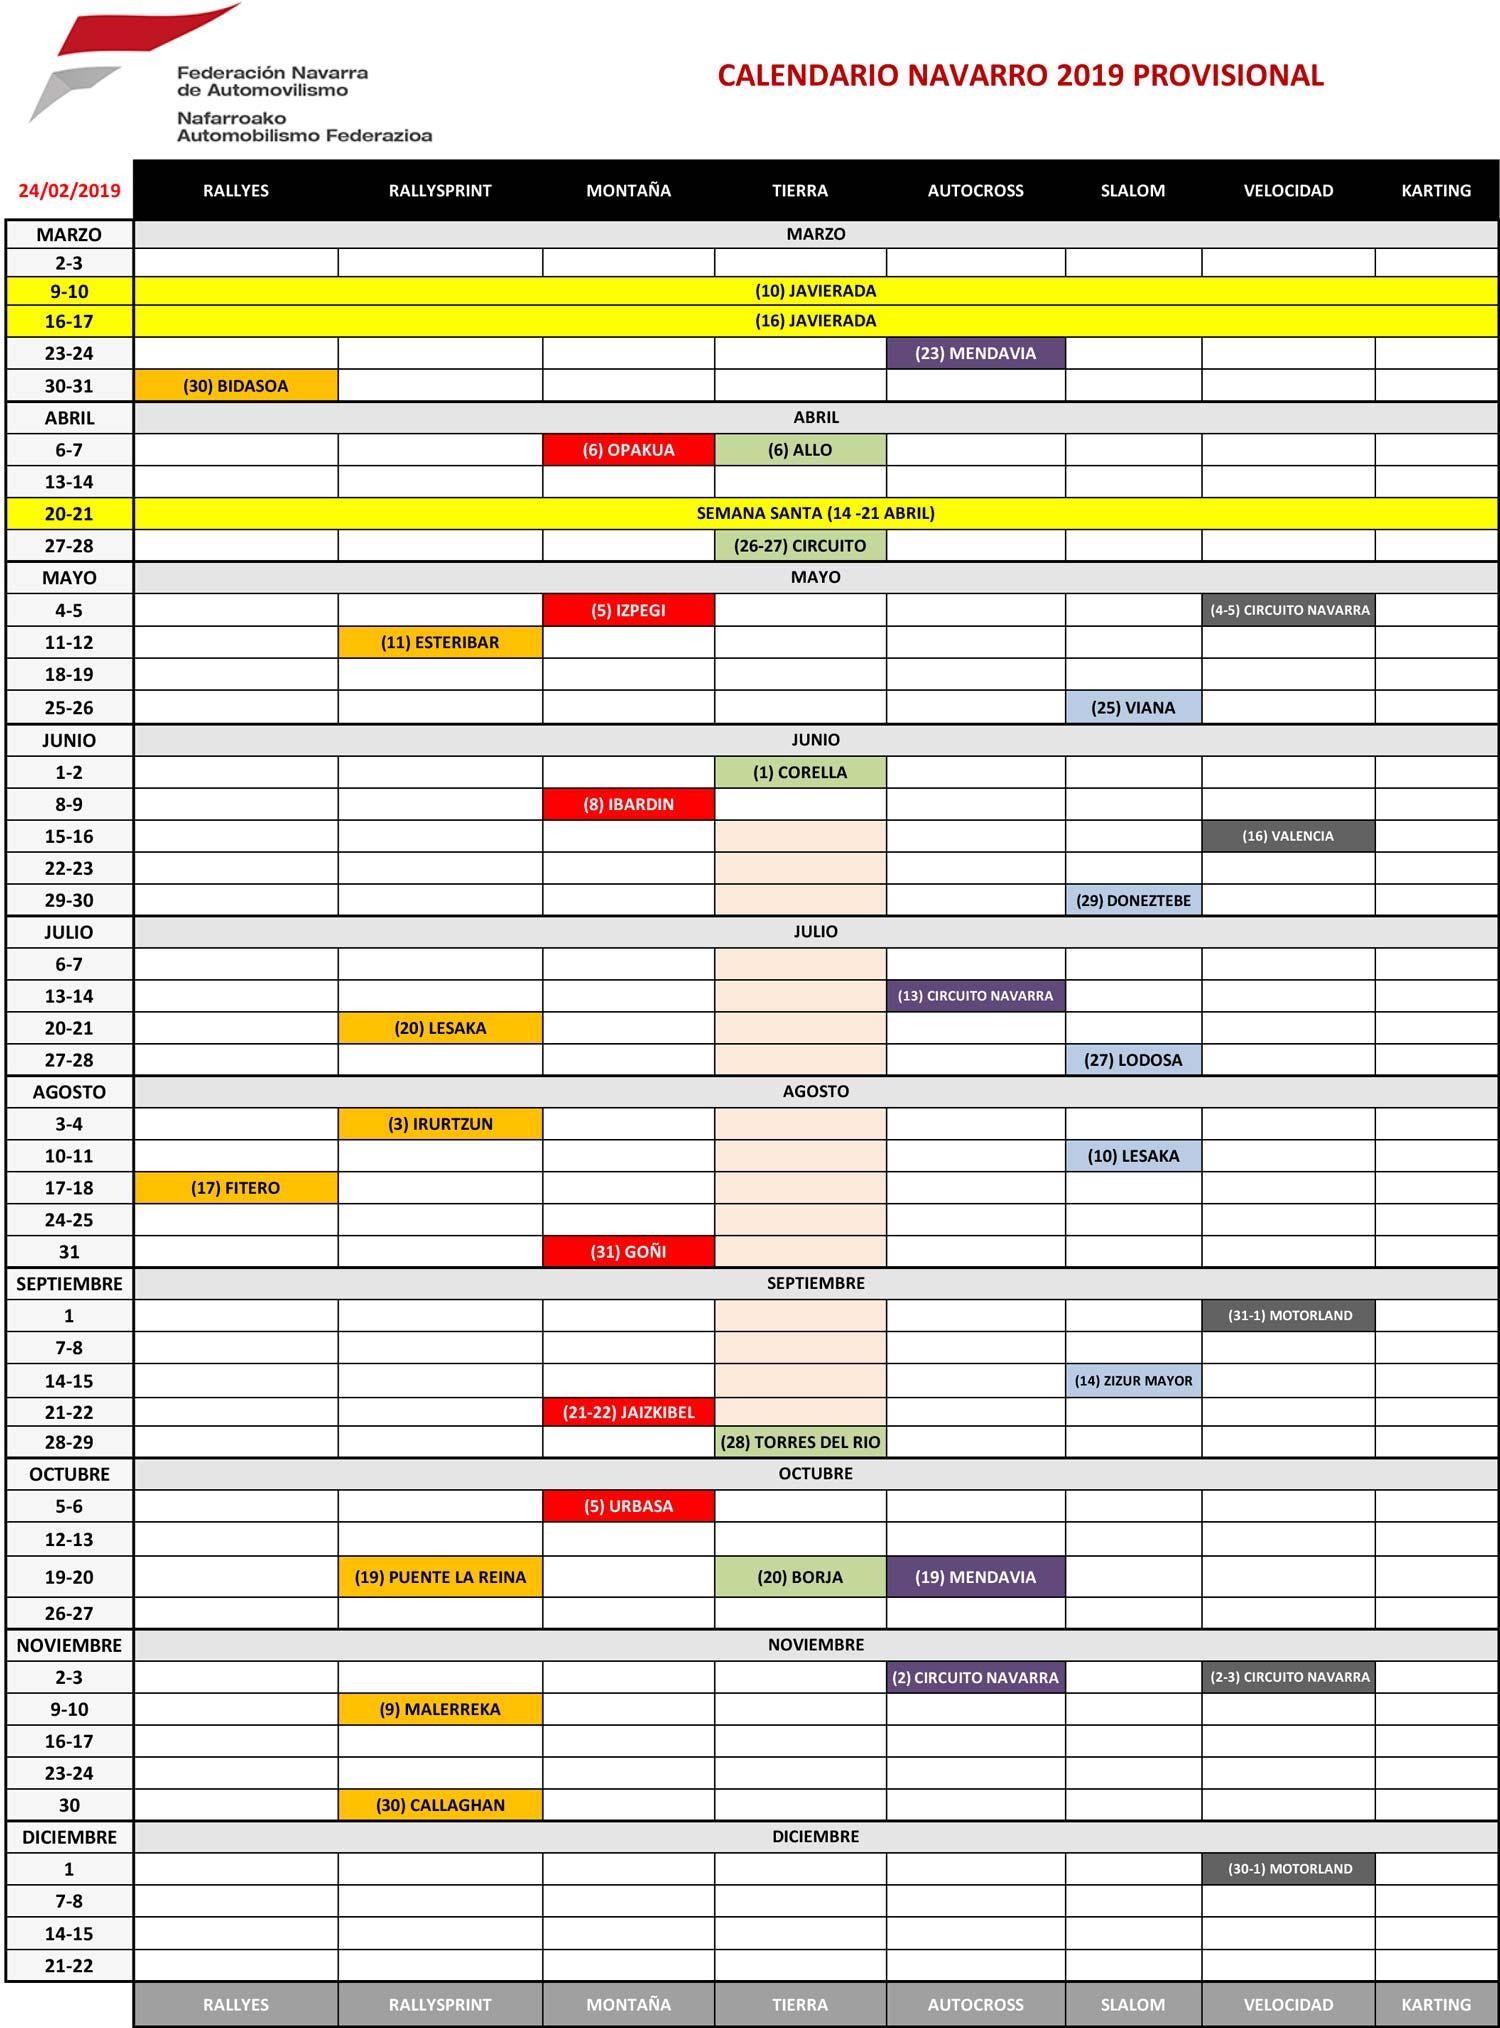 Calendario Autodromo Pedro Cofino 2019.Calendario Autocross 2019 Ikbenalles